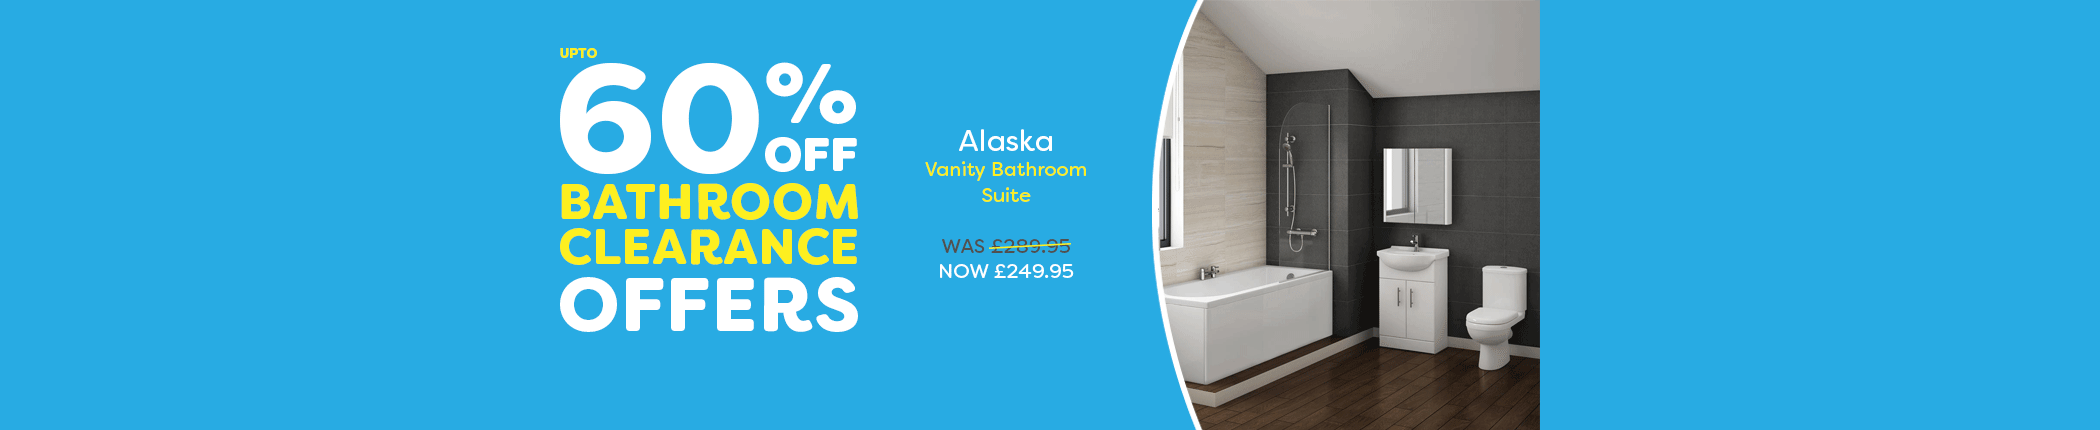 bathroom-clearance-offers-alaska-vanity-bathroom-suite-feb17-hbnr